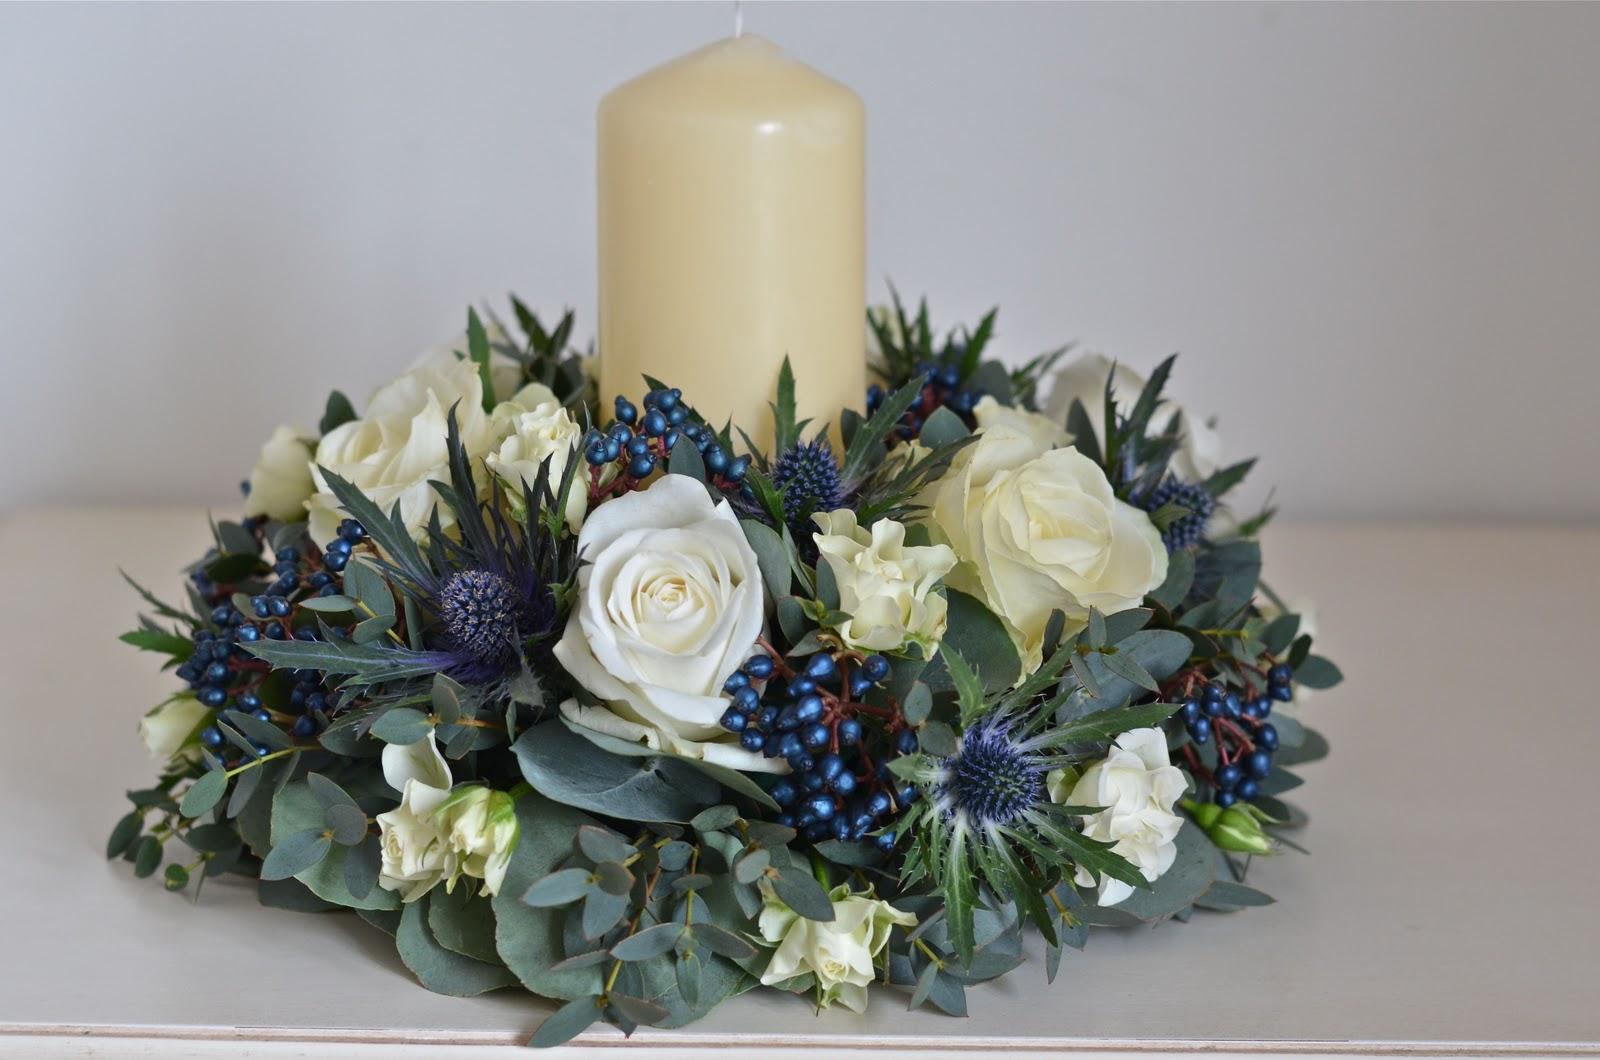 Wedding Flowers Blog: Nina's Winter Wedding Flowers ...